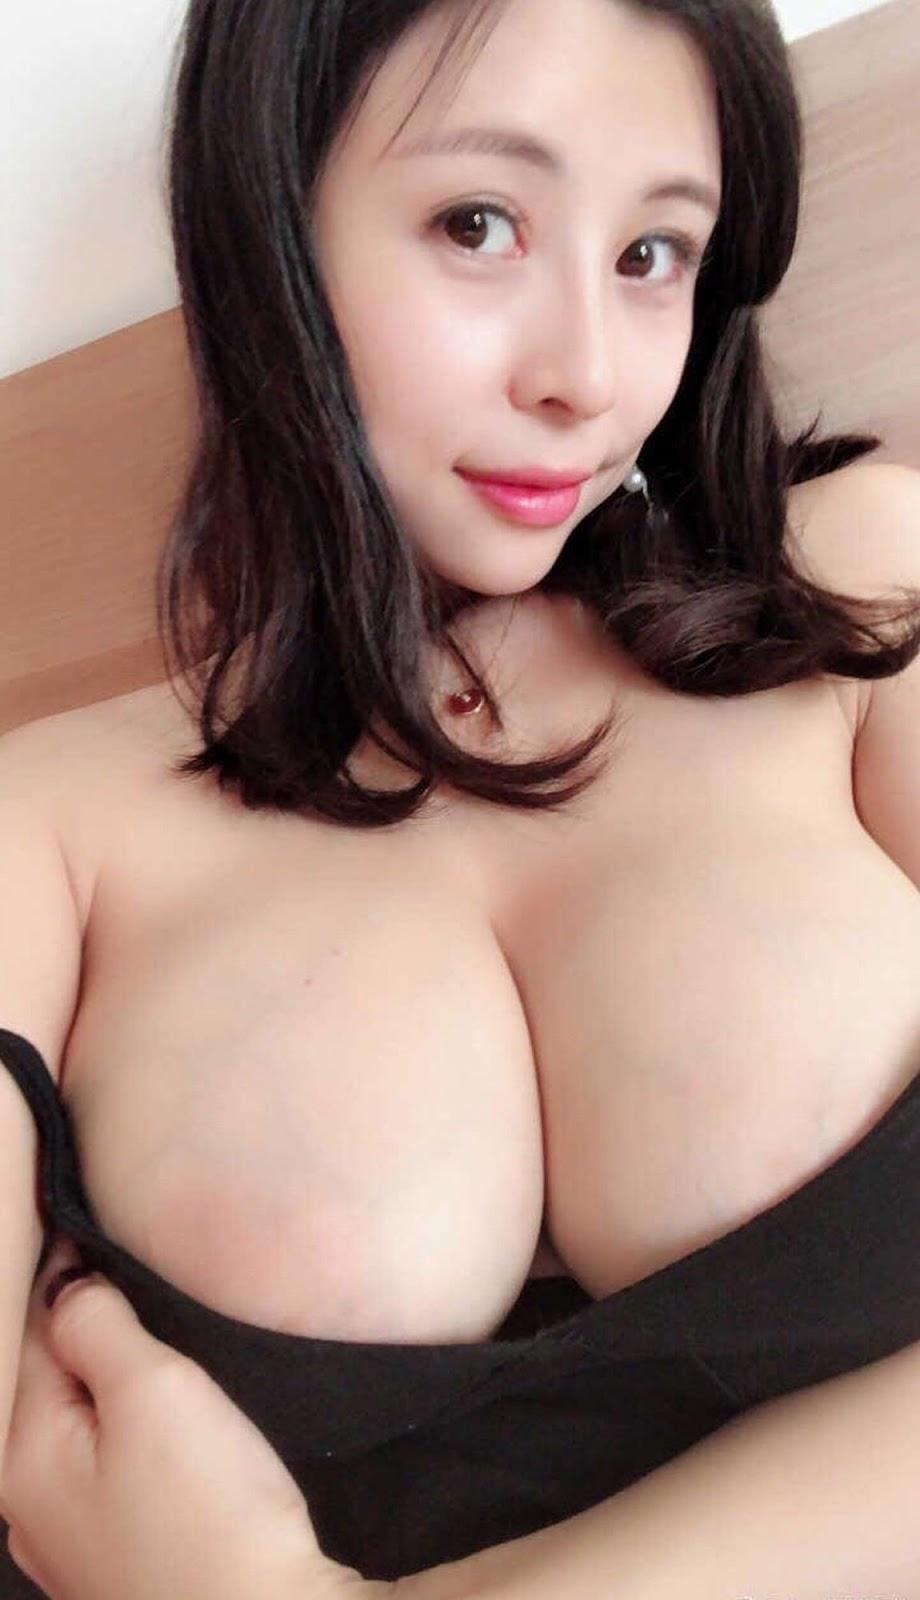 aHR0cHM6Ly93d3cubXlteXBpYy5uZXQvZGF0YS9hdHRhY2htZW50L2ZvcnVtLzIwMTkwOC8yMC8wODM0MDRpdHZsczY1NTd2bm9kZHo1LmpwZy50aHVtYi5qcGc%253D - 成都瓶儿 - Chengdu Pinger big tits selfie nude 2020